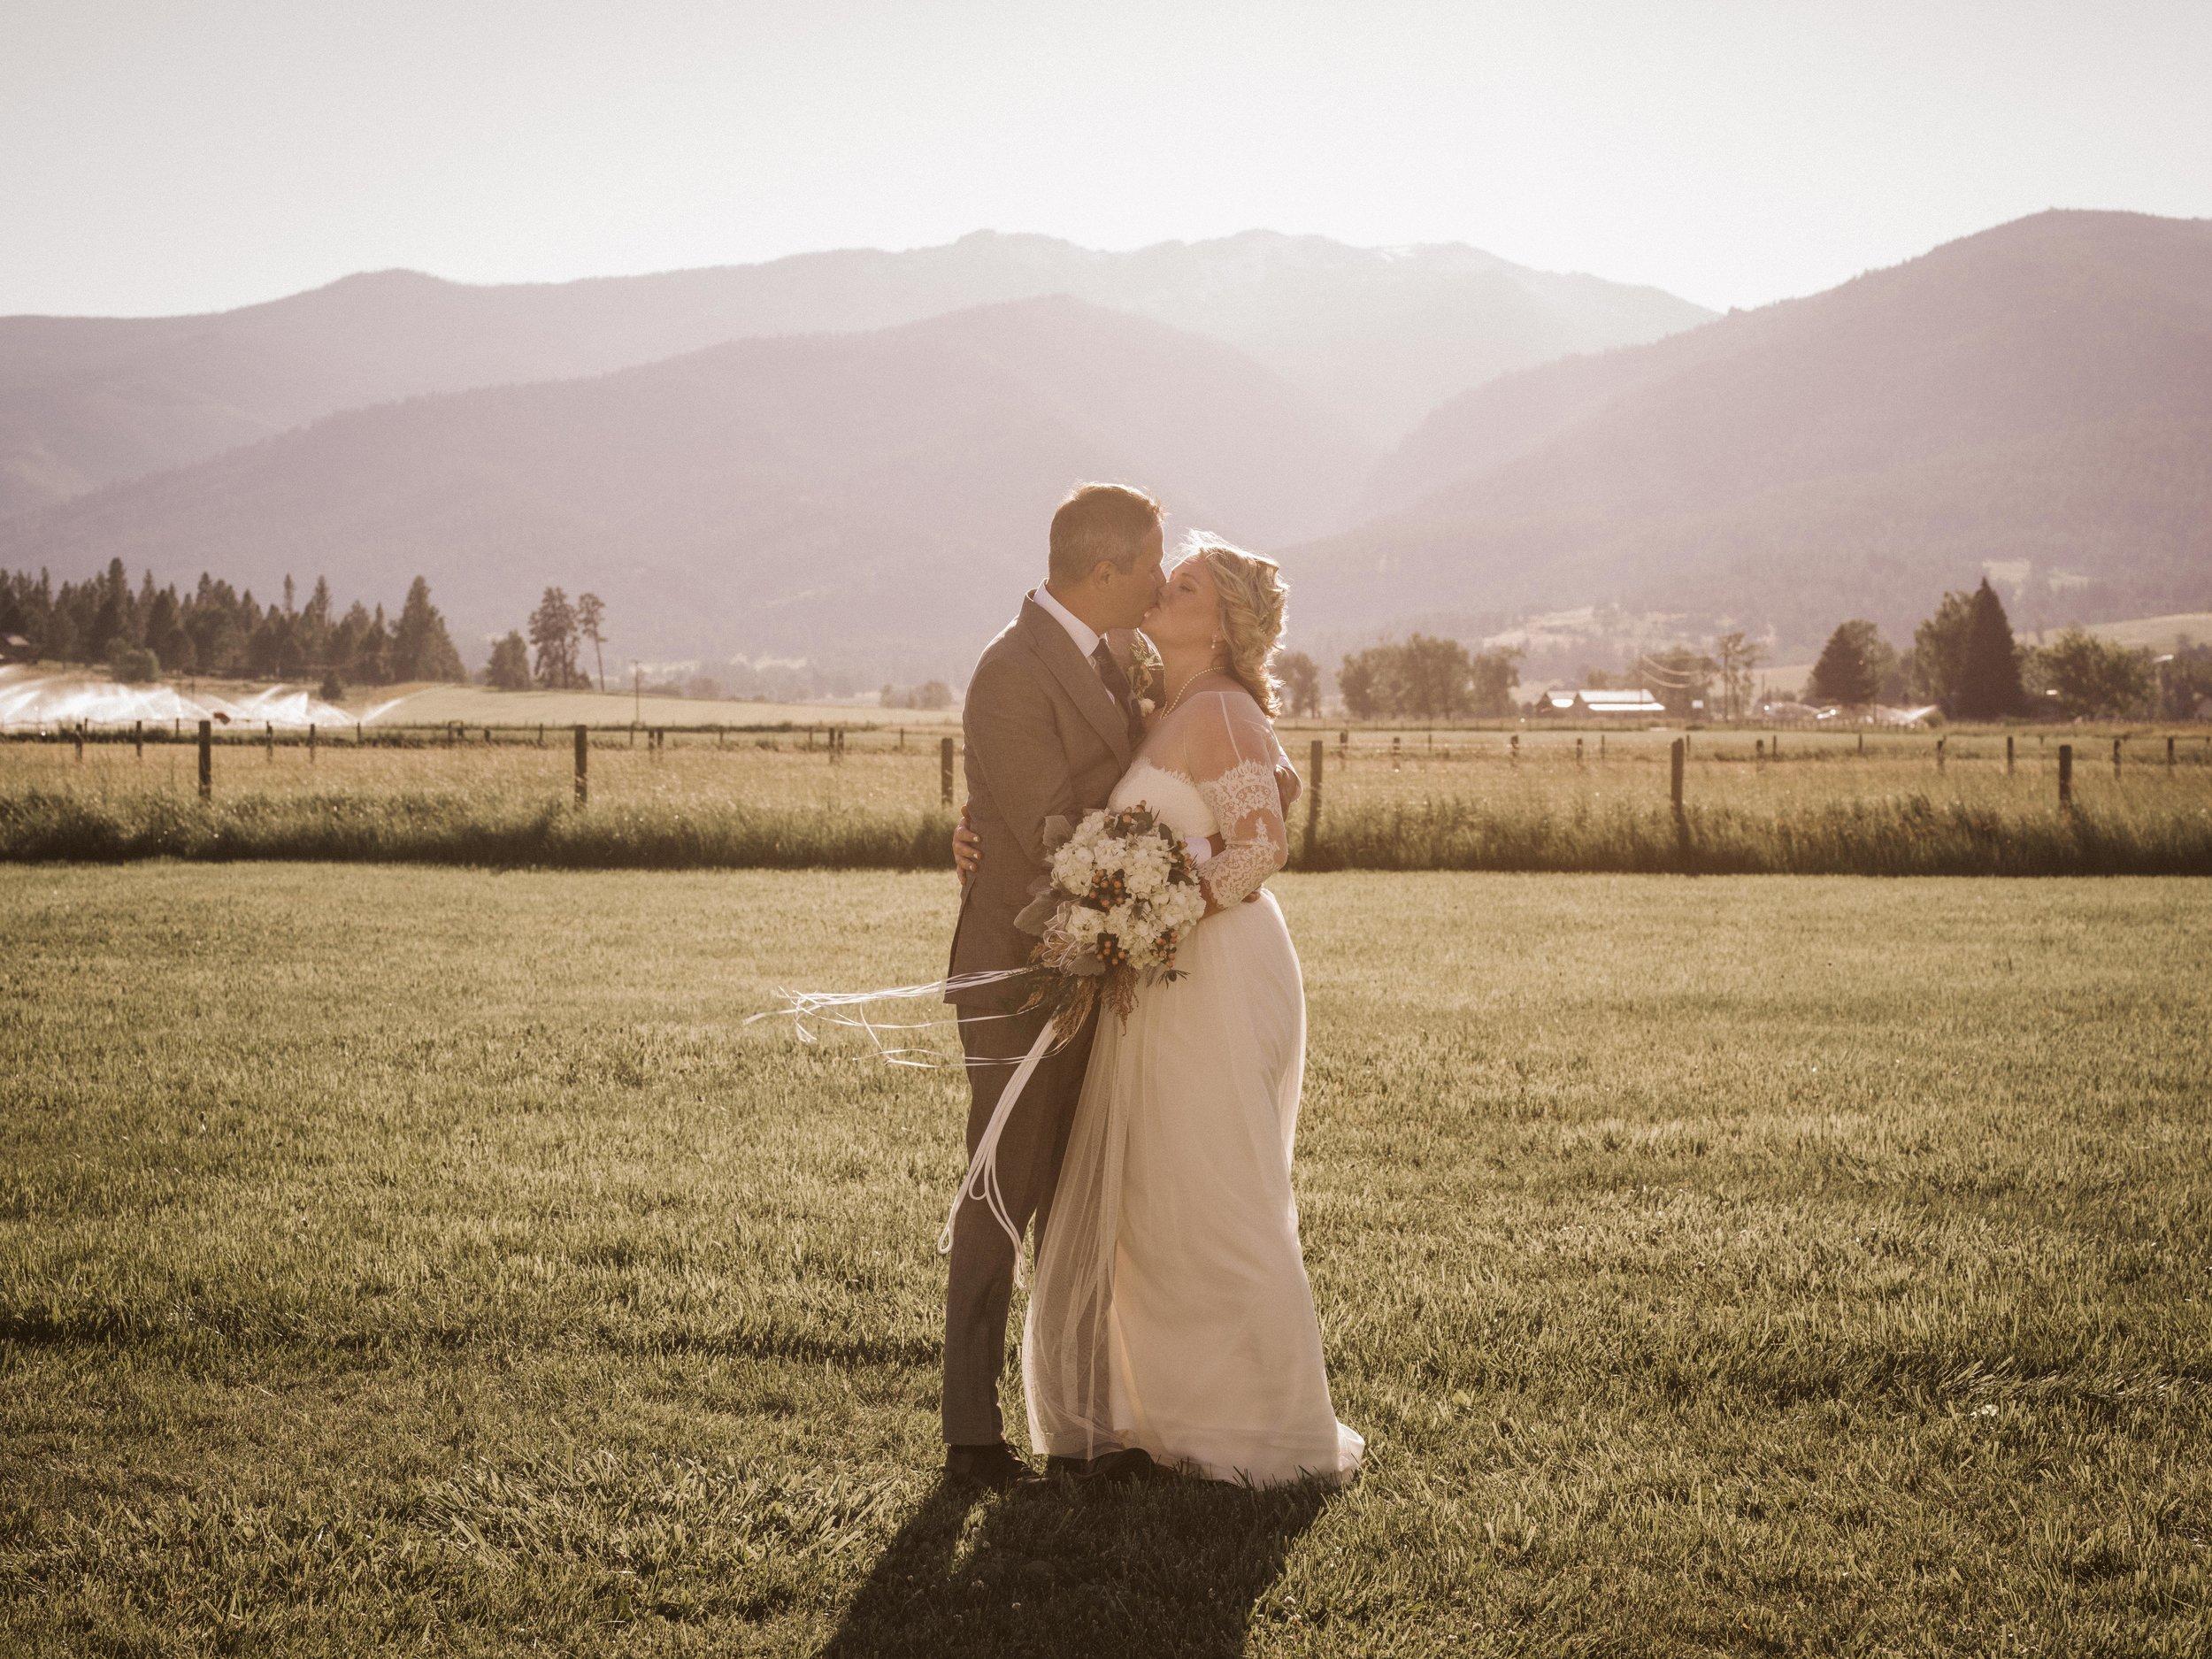 matt-taeko-wedding-2018-small-5413.jpg